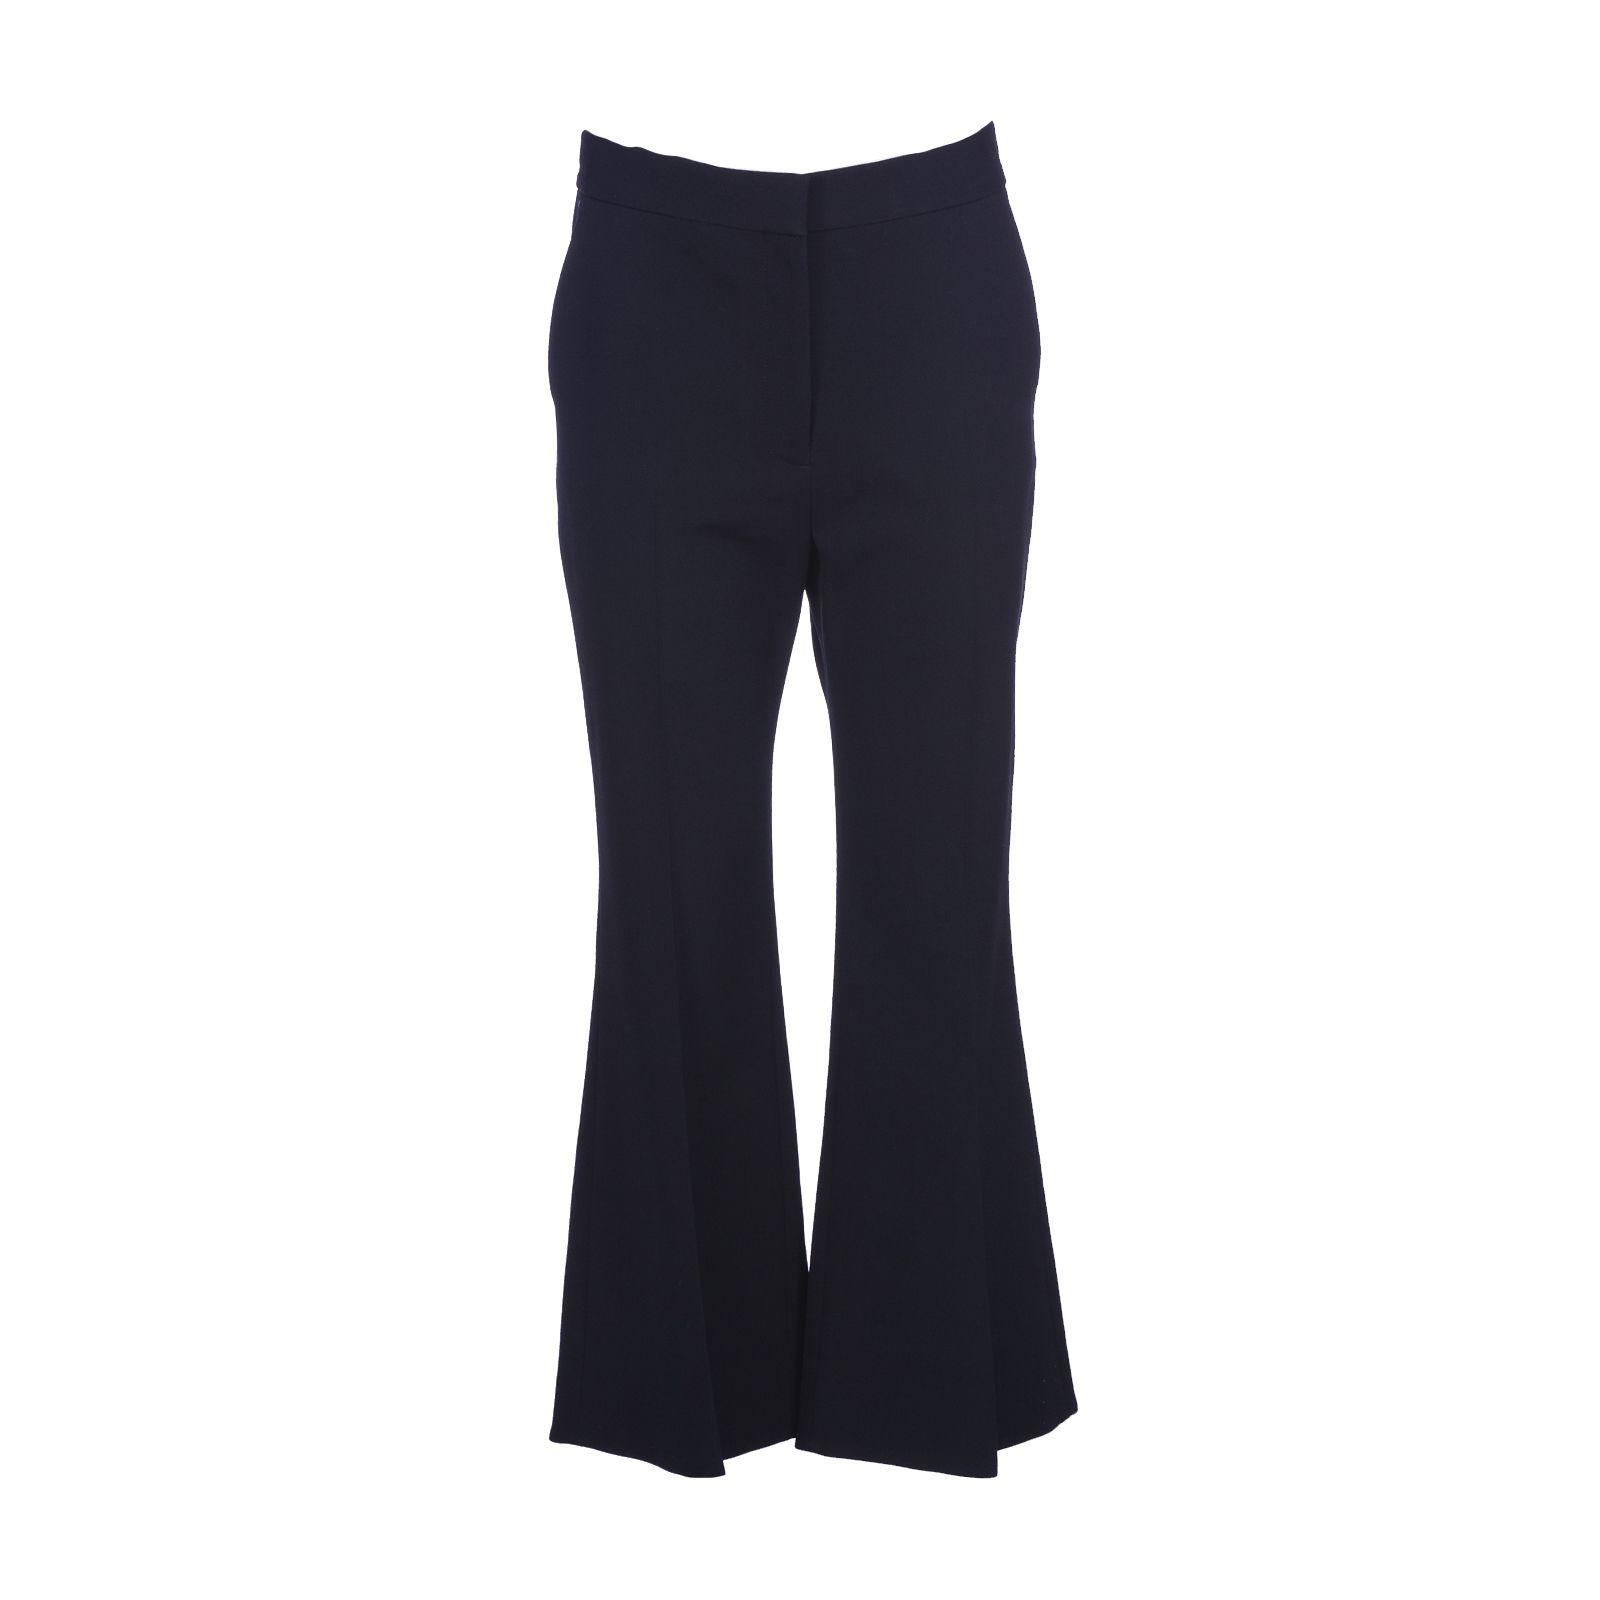 Stella Mccartney Black Angela Cropped Trousers